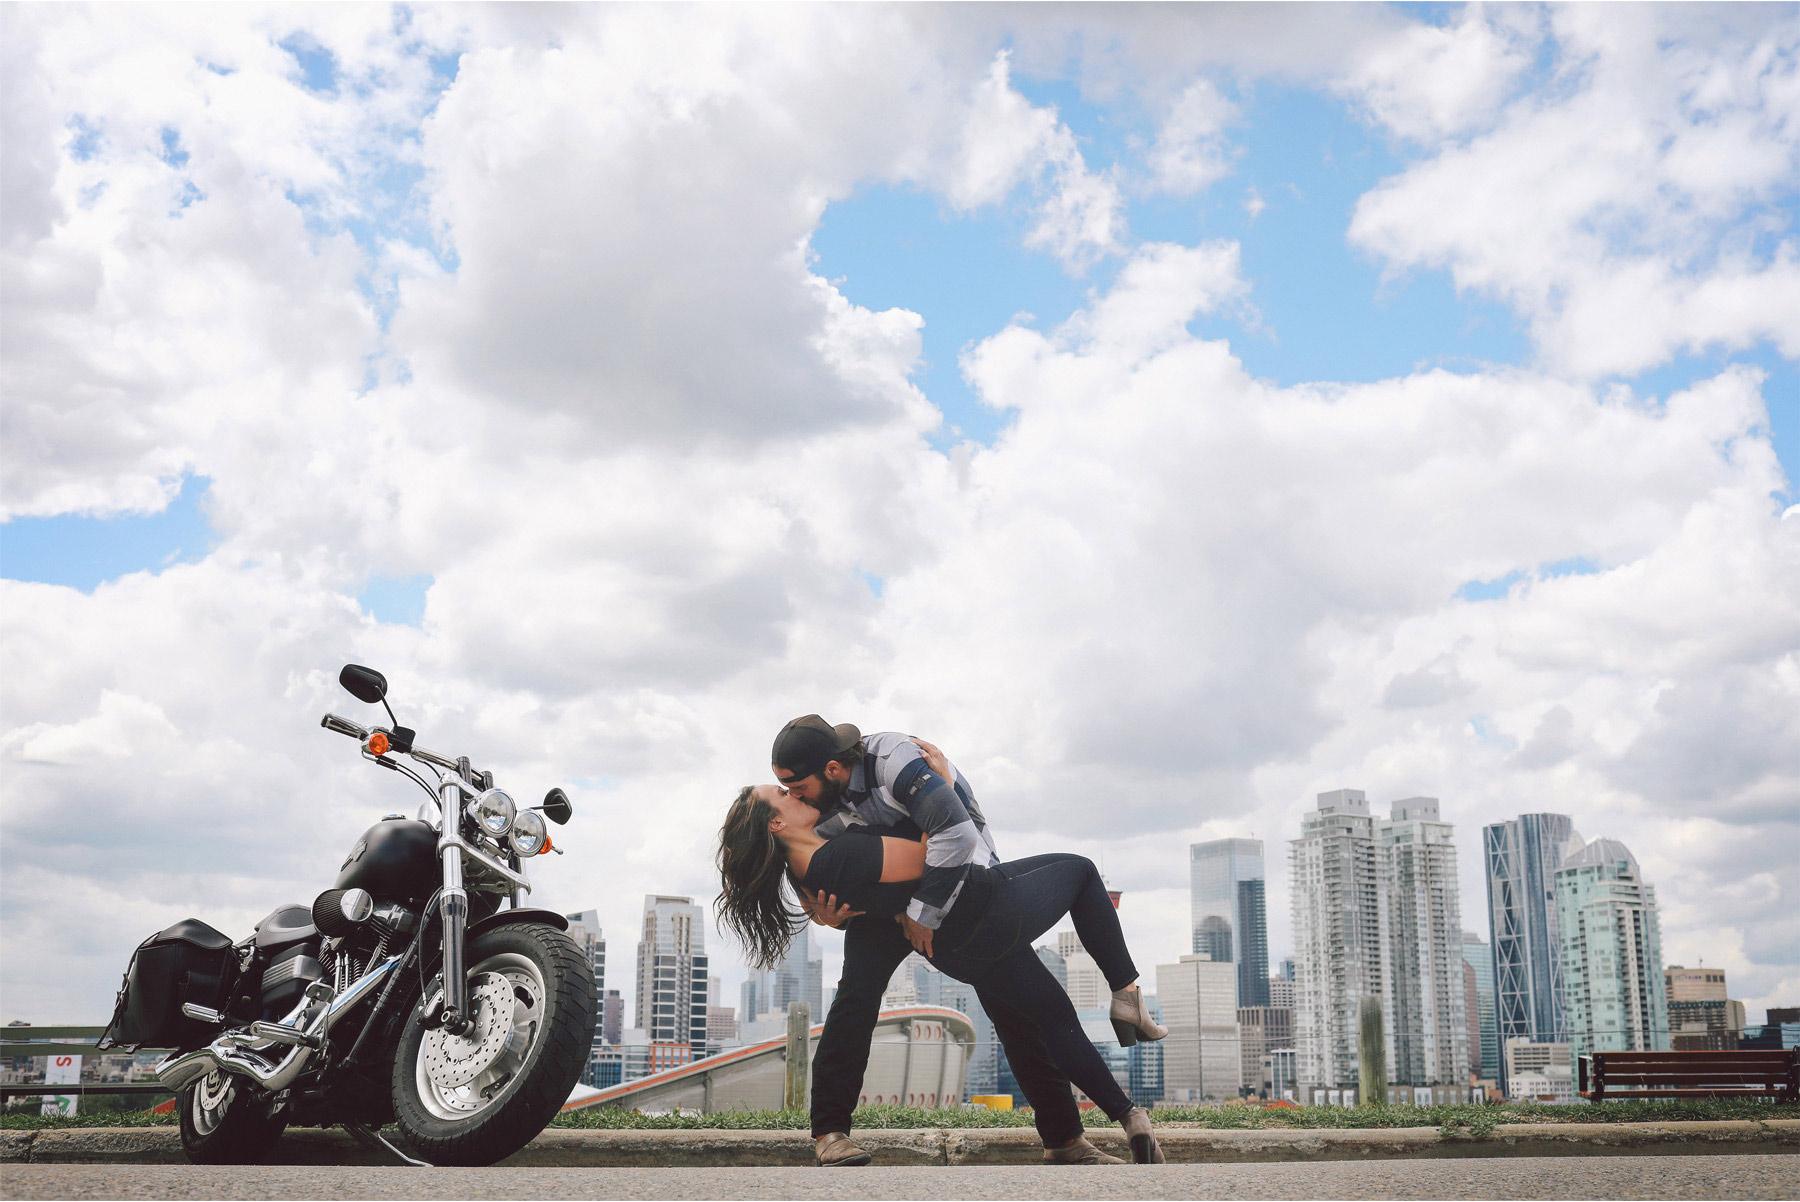 10-Calgary-Canada-Engagement-Photography-by-Vick-Photography-Bikers-Harley-Davidson-Skyline-Lizz-and-Brady.jpg